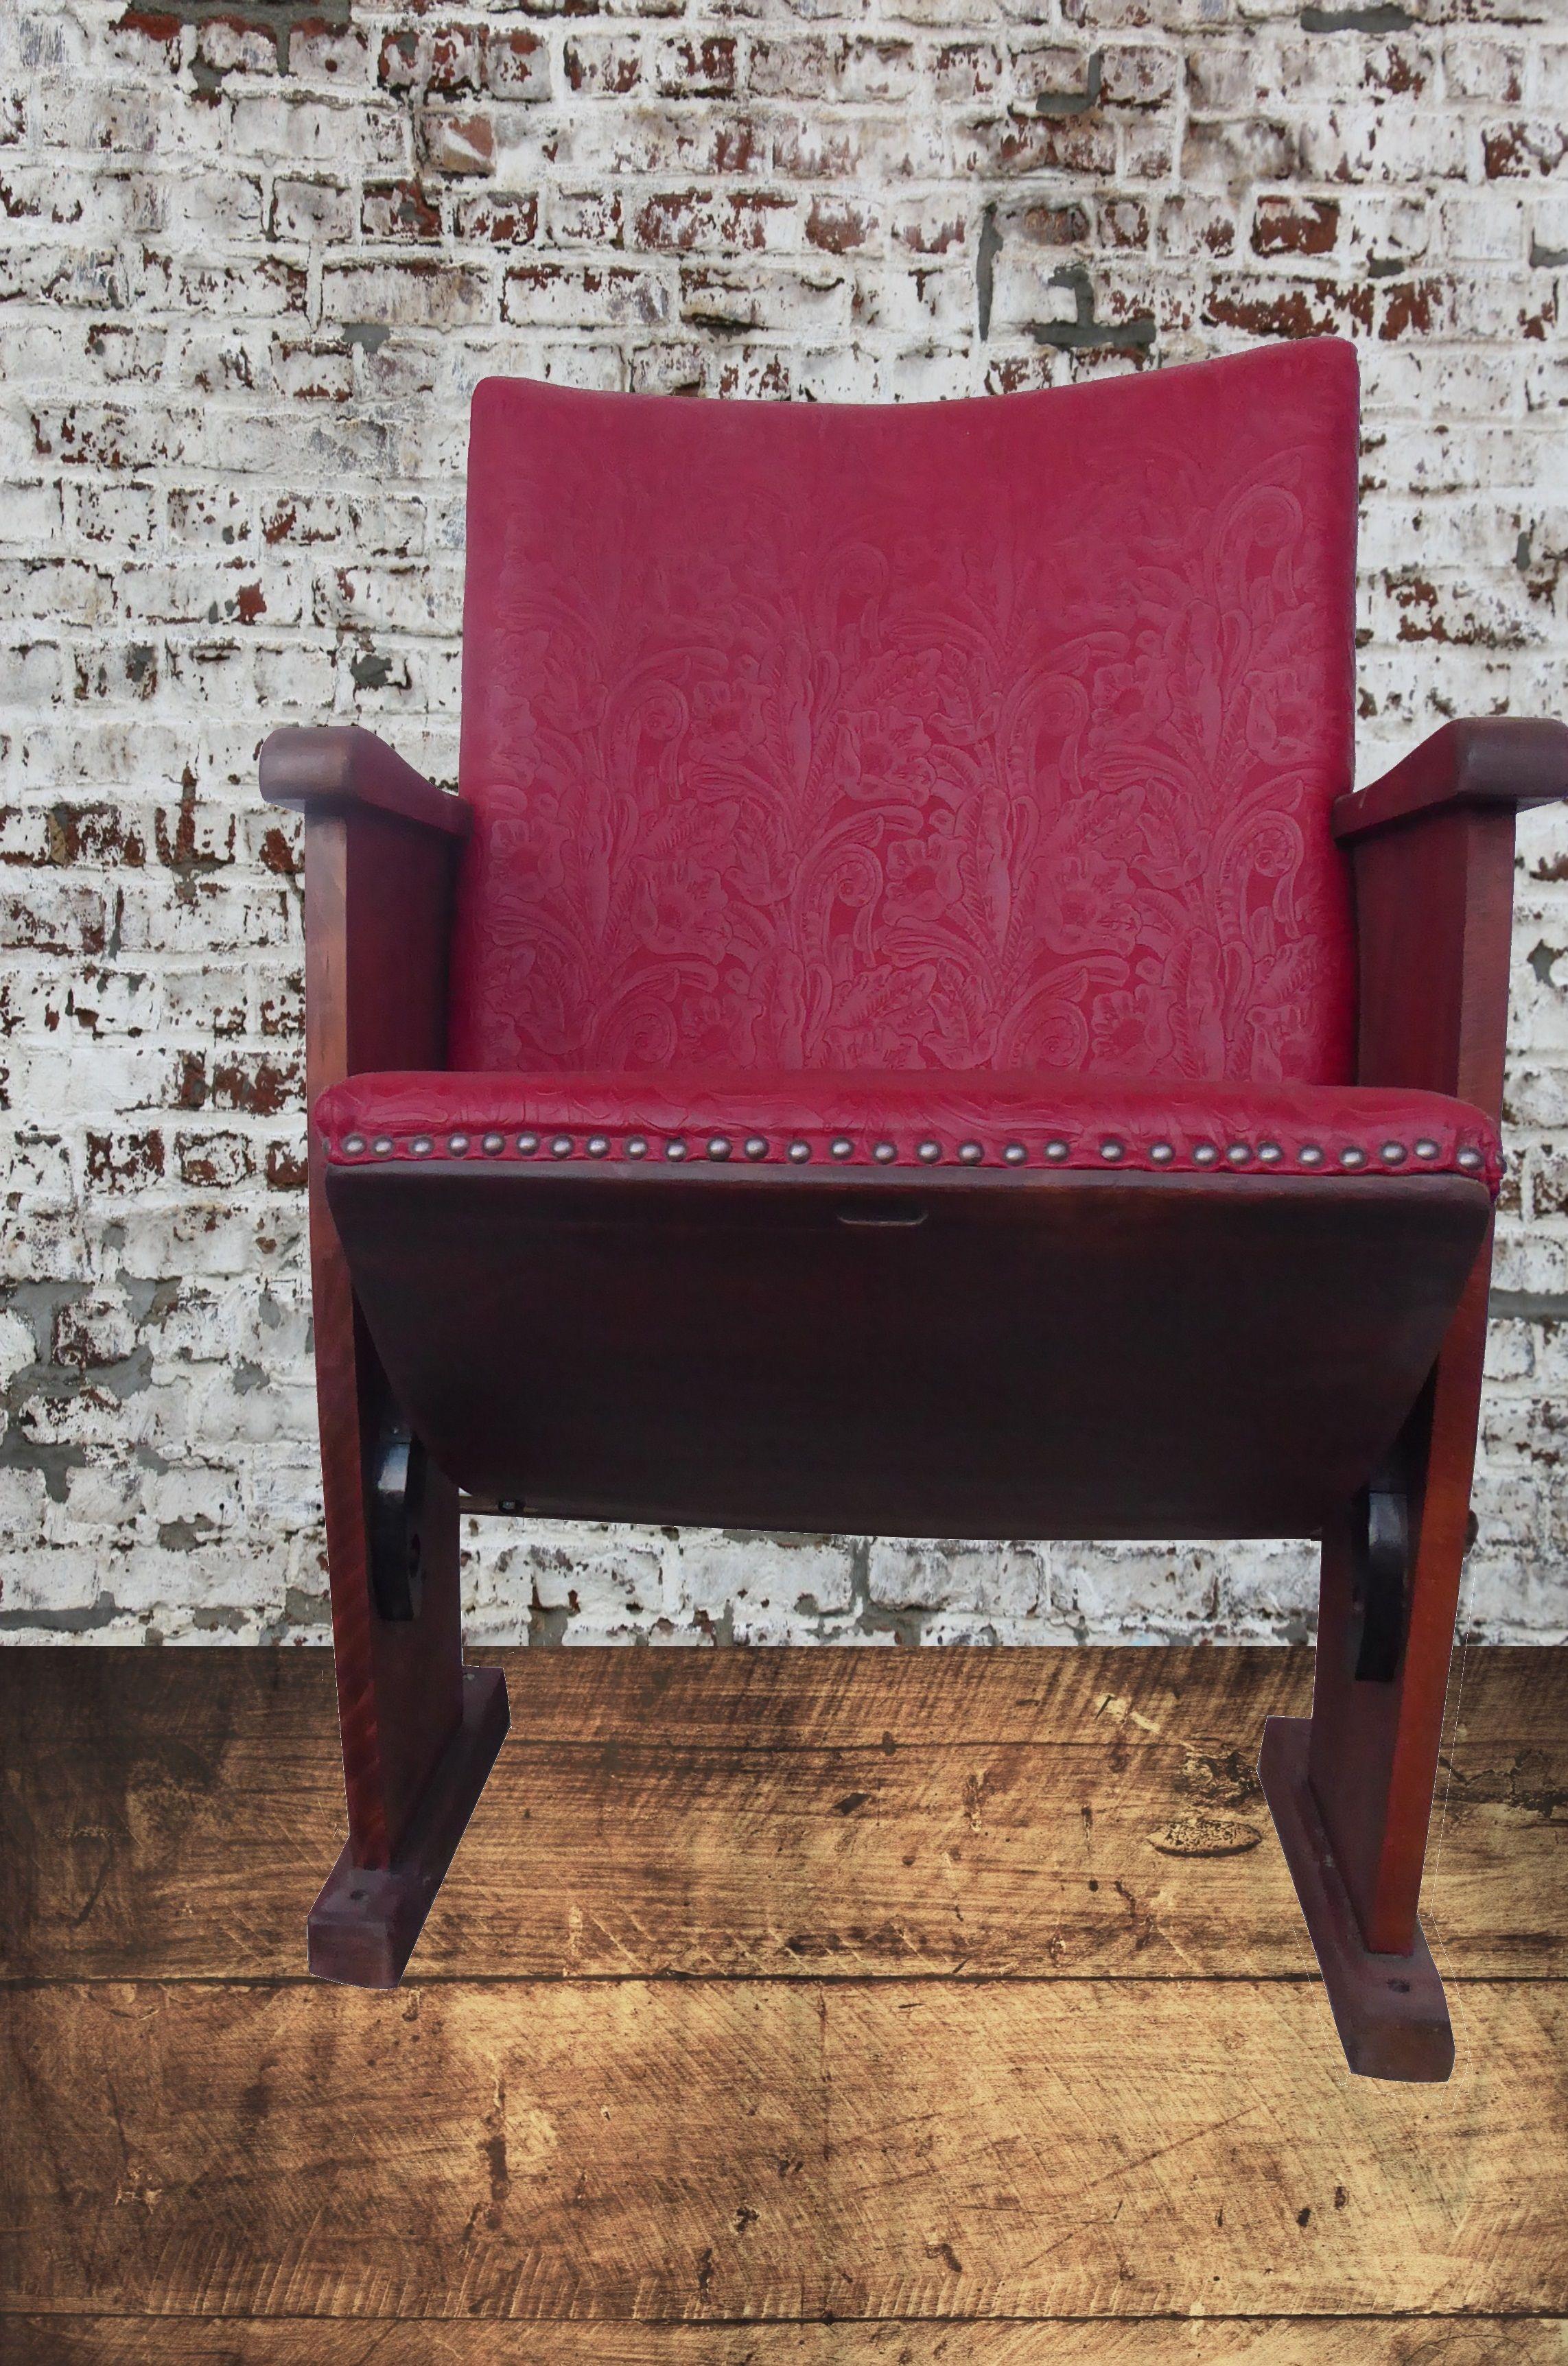 Vintagecinemachair Vintagefurniture Livingroom Interiorideas Seating Made Of Oakwood Completeyl Reworked And Re Kinostuhle Online Mobel Wohnzimmersessel